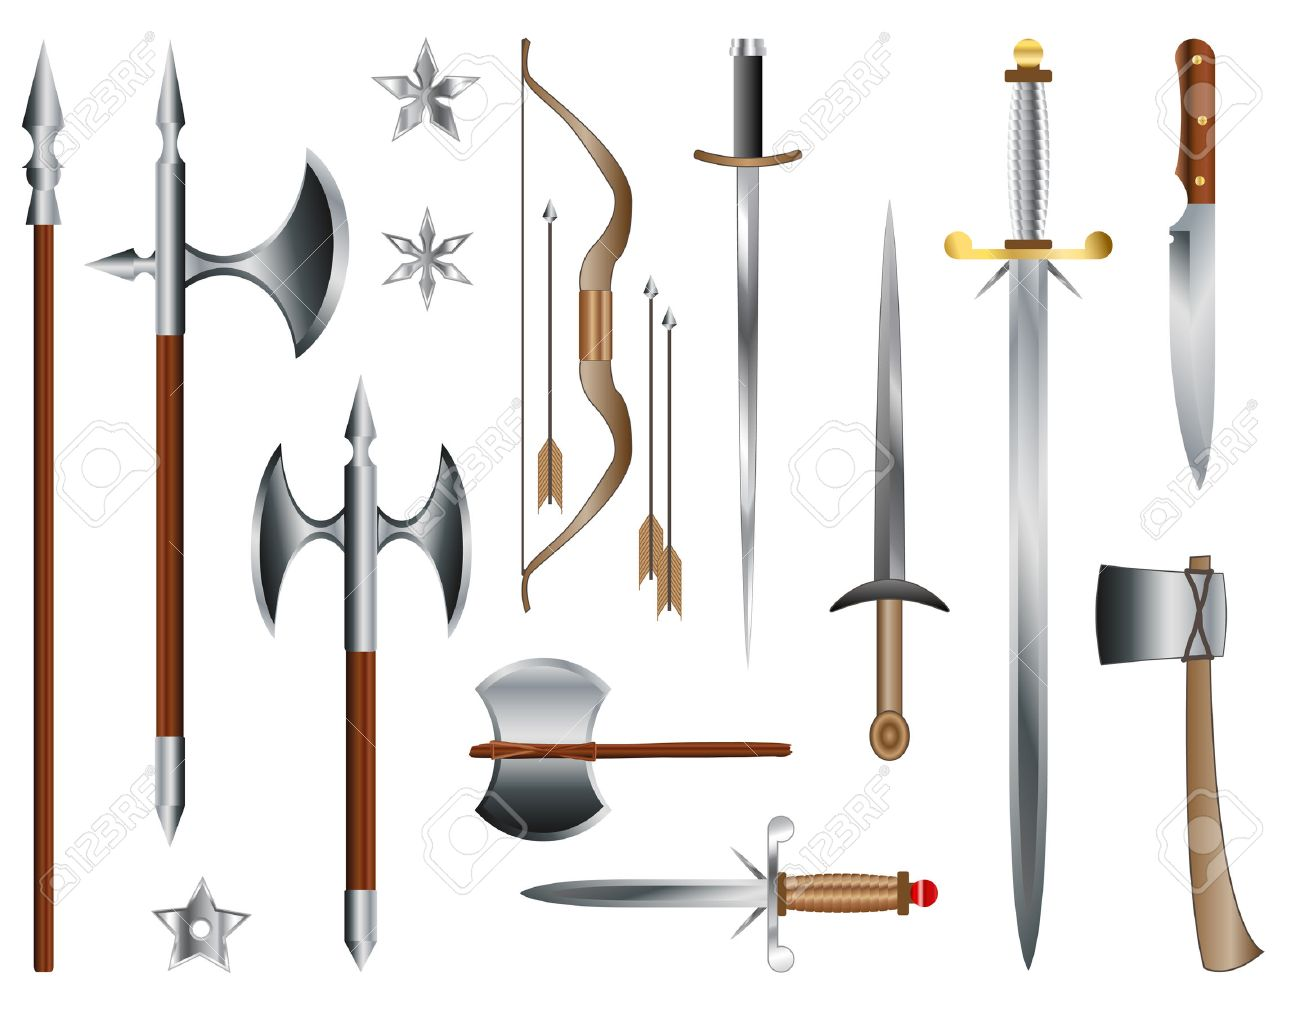 Medieval swords, Swords and Medieval on Pinterest